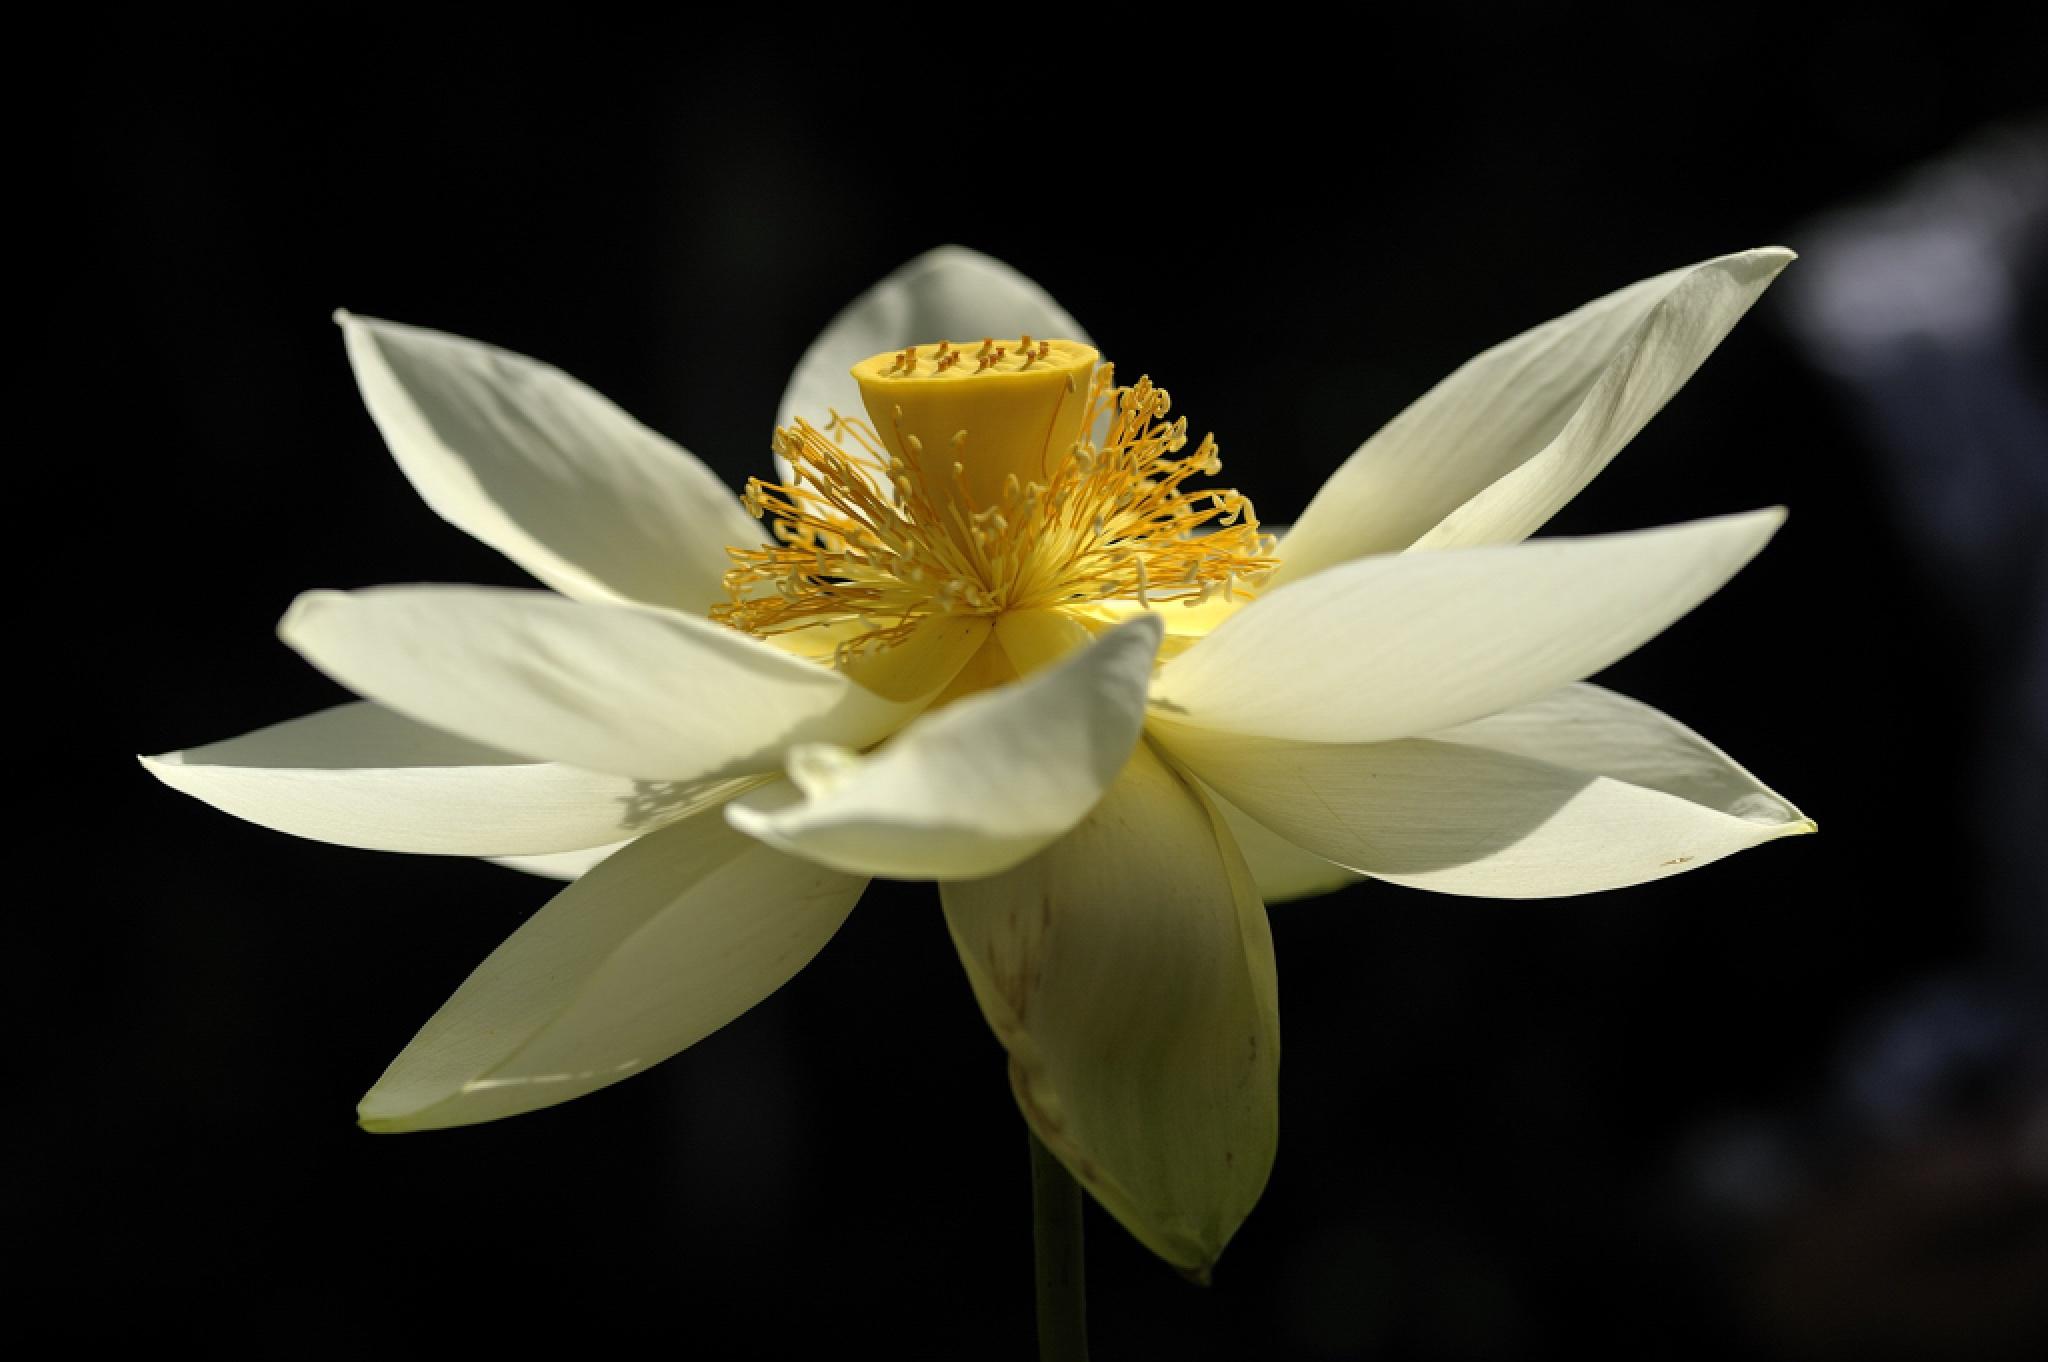 white beauty by Stephan Winkler